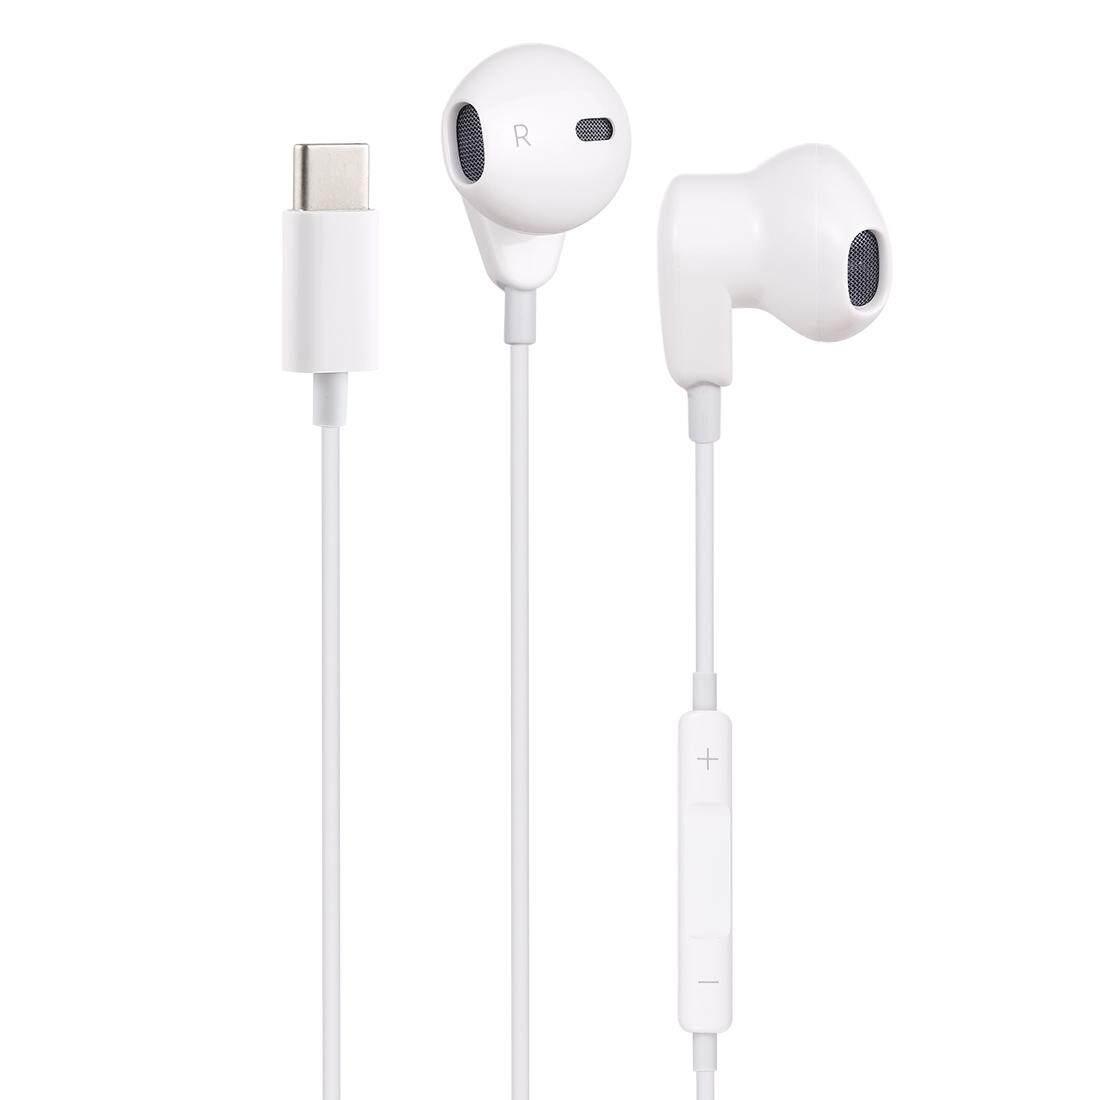 ME563-T 1.2 M หูฟังแบบใช้สาย USB-C/Type-C ชุดหูฟังพร้อมไมโครโฟน,สำหรับ Huawei, xiaomi และสมาร์ทโฟนอื่นๆกับ USB-C/อินเทอร์เฟซ Type-C (สีขาว)